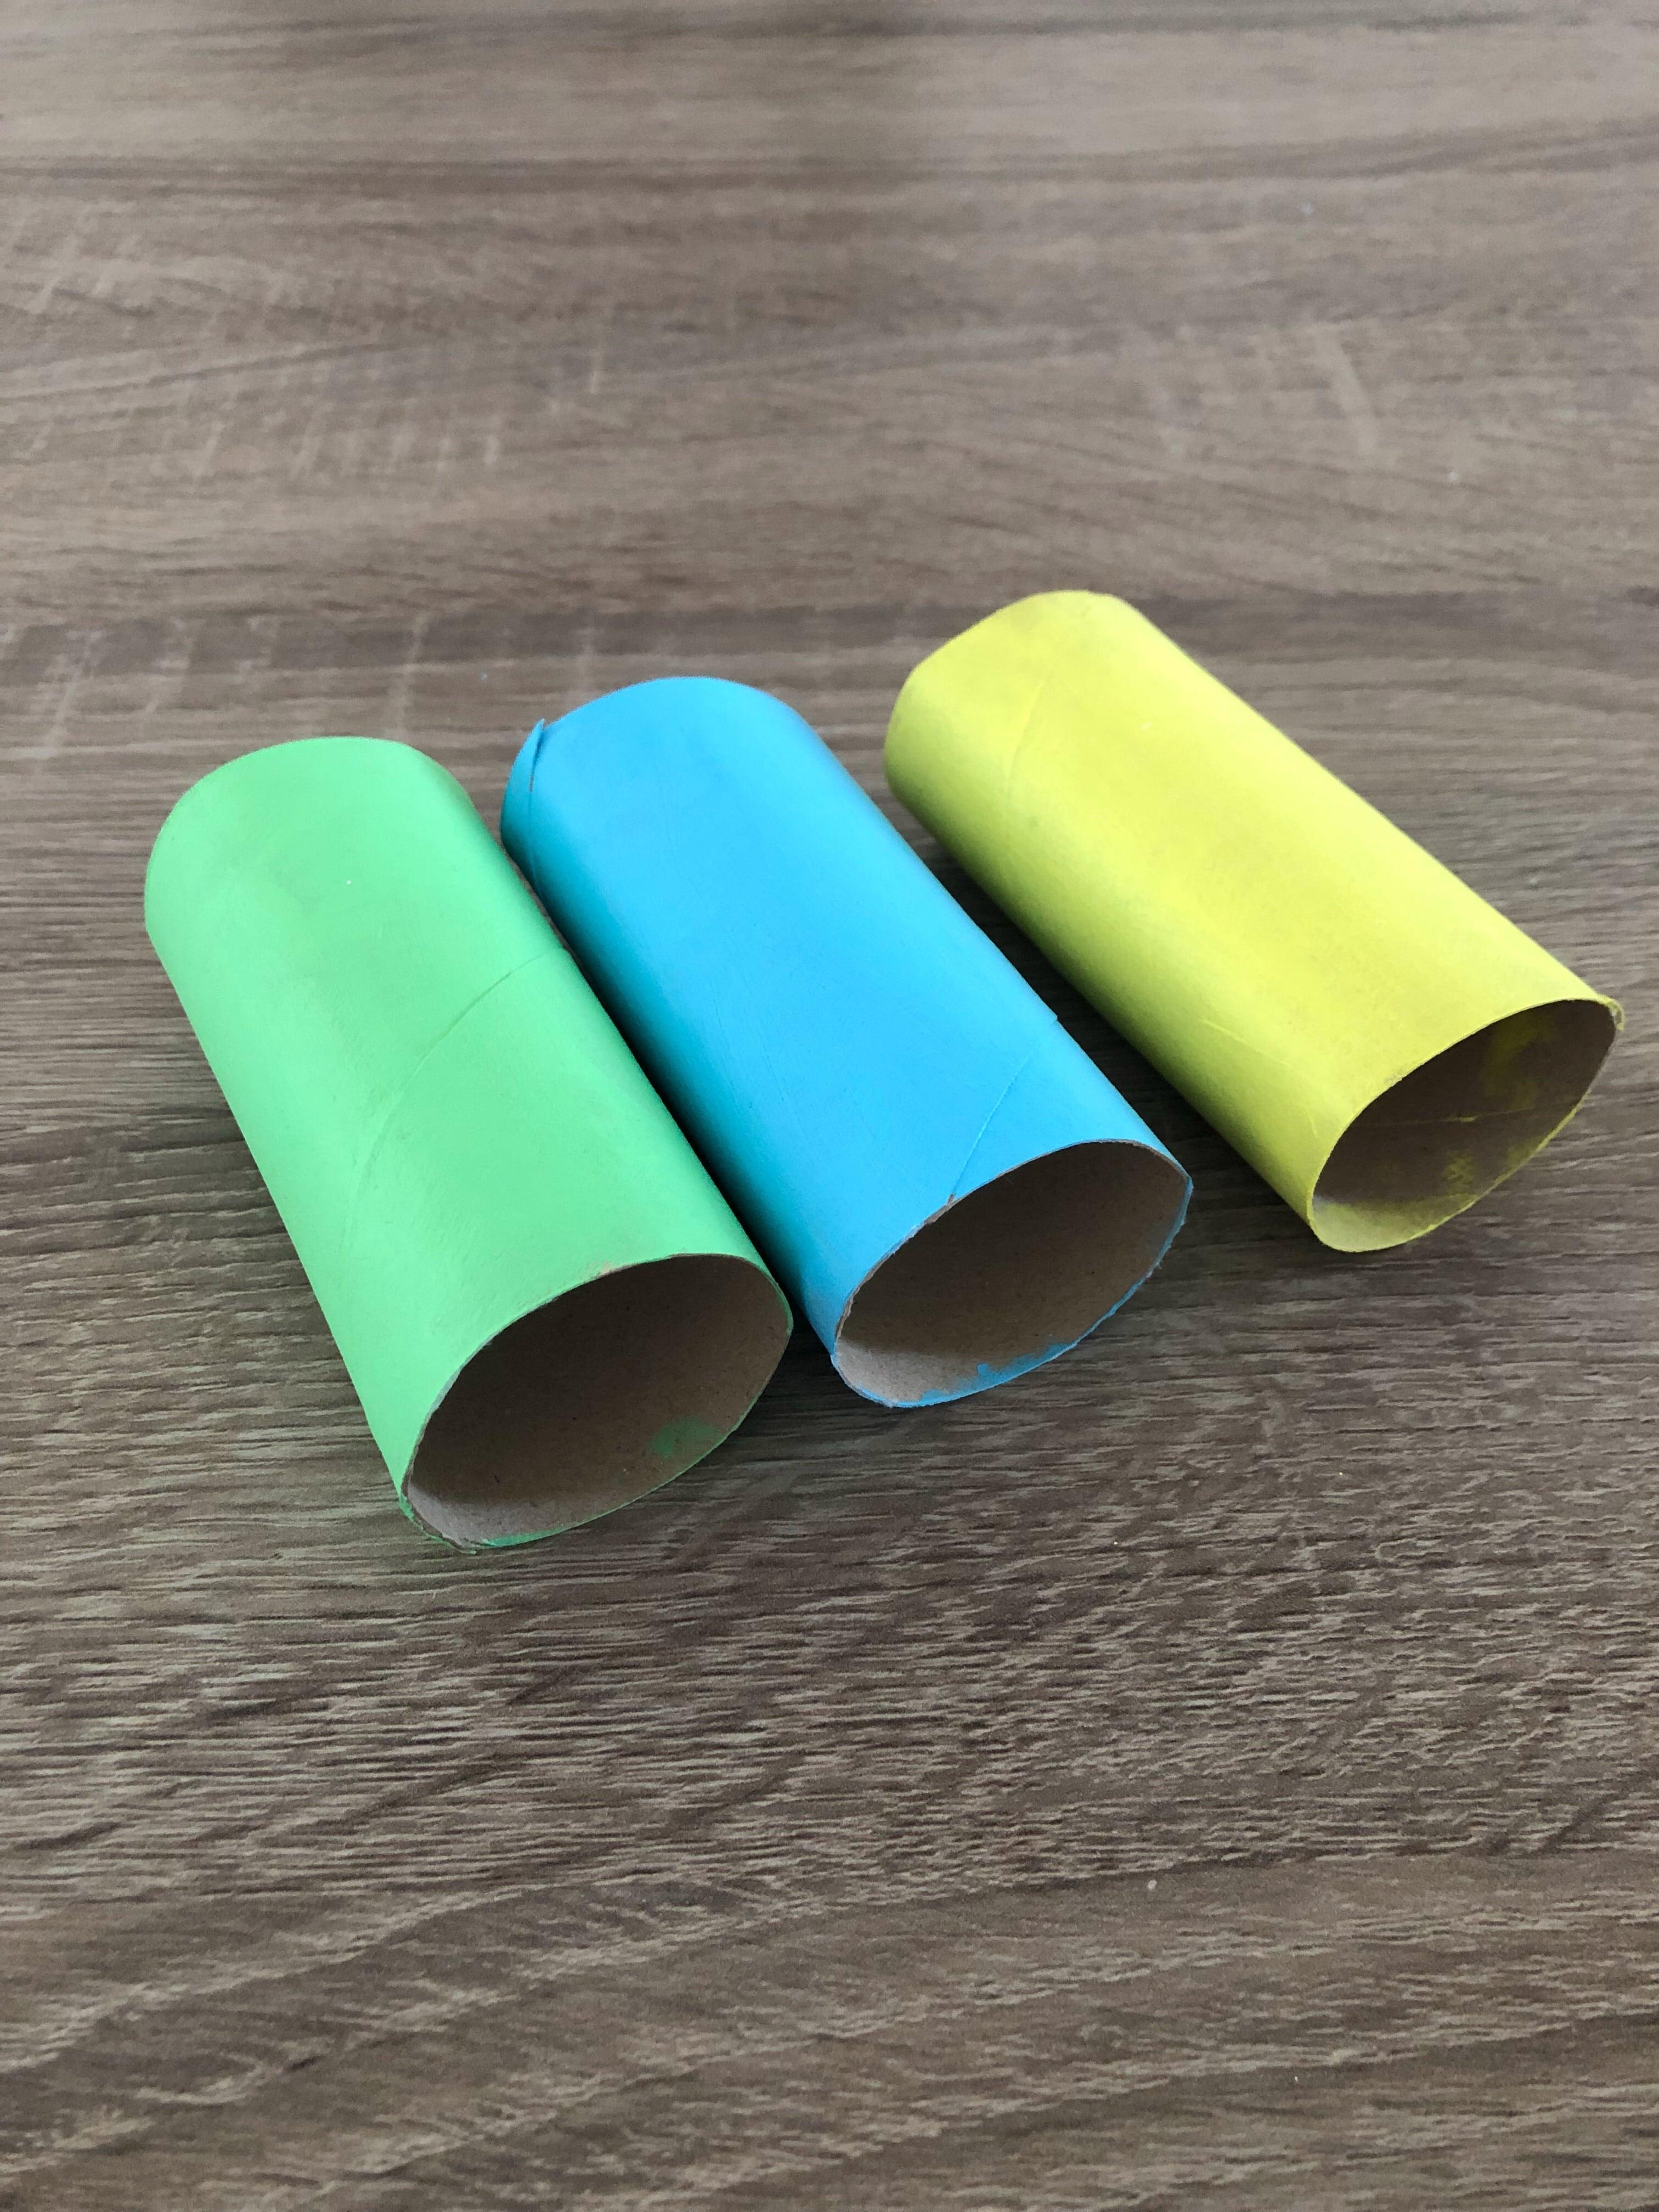 Rollo de papel higiénico pintado